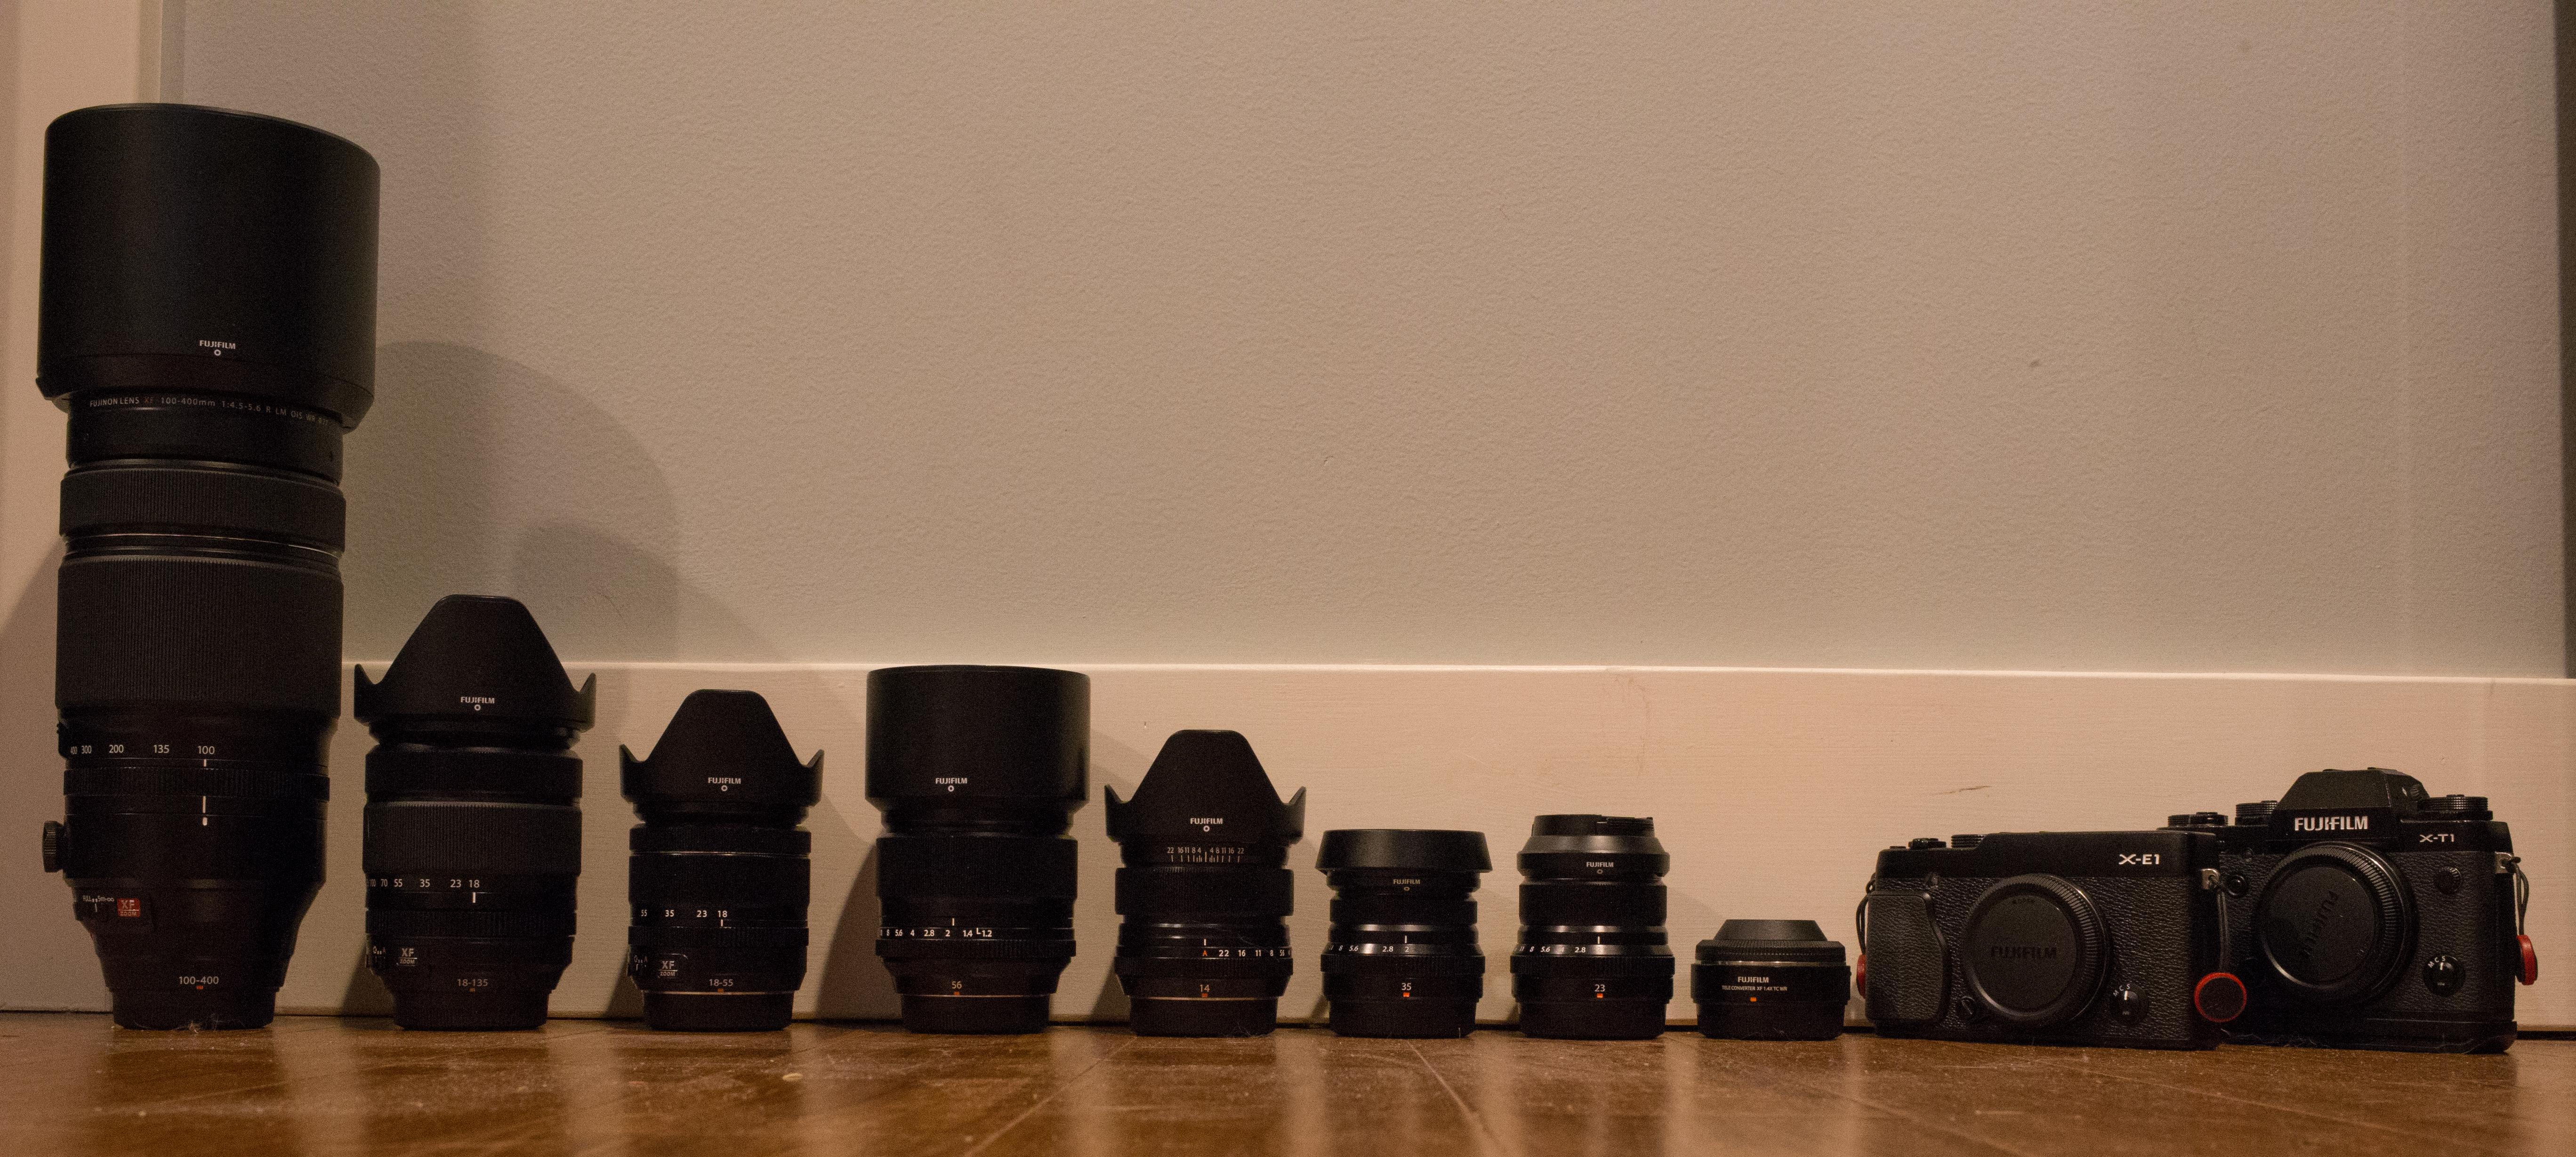 Fuji X-T1, X-E1, XF 14mm f/2.8, 23mm f/2, 35mm f/2, 56mm f/1.2, 18-55mm f/2.8-4, 18-135mm, 100-400mm